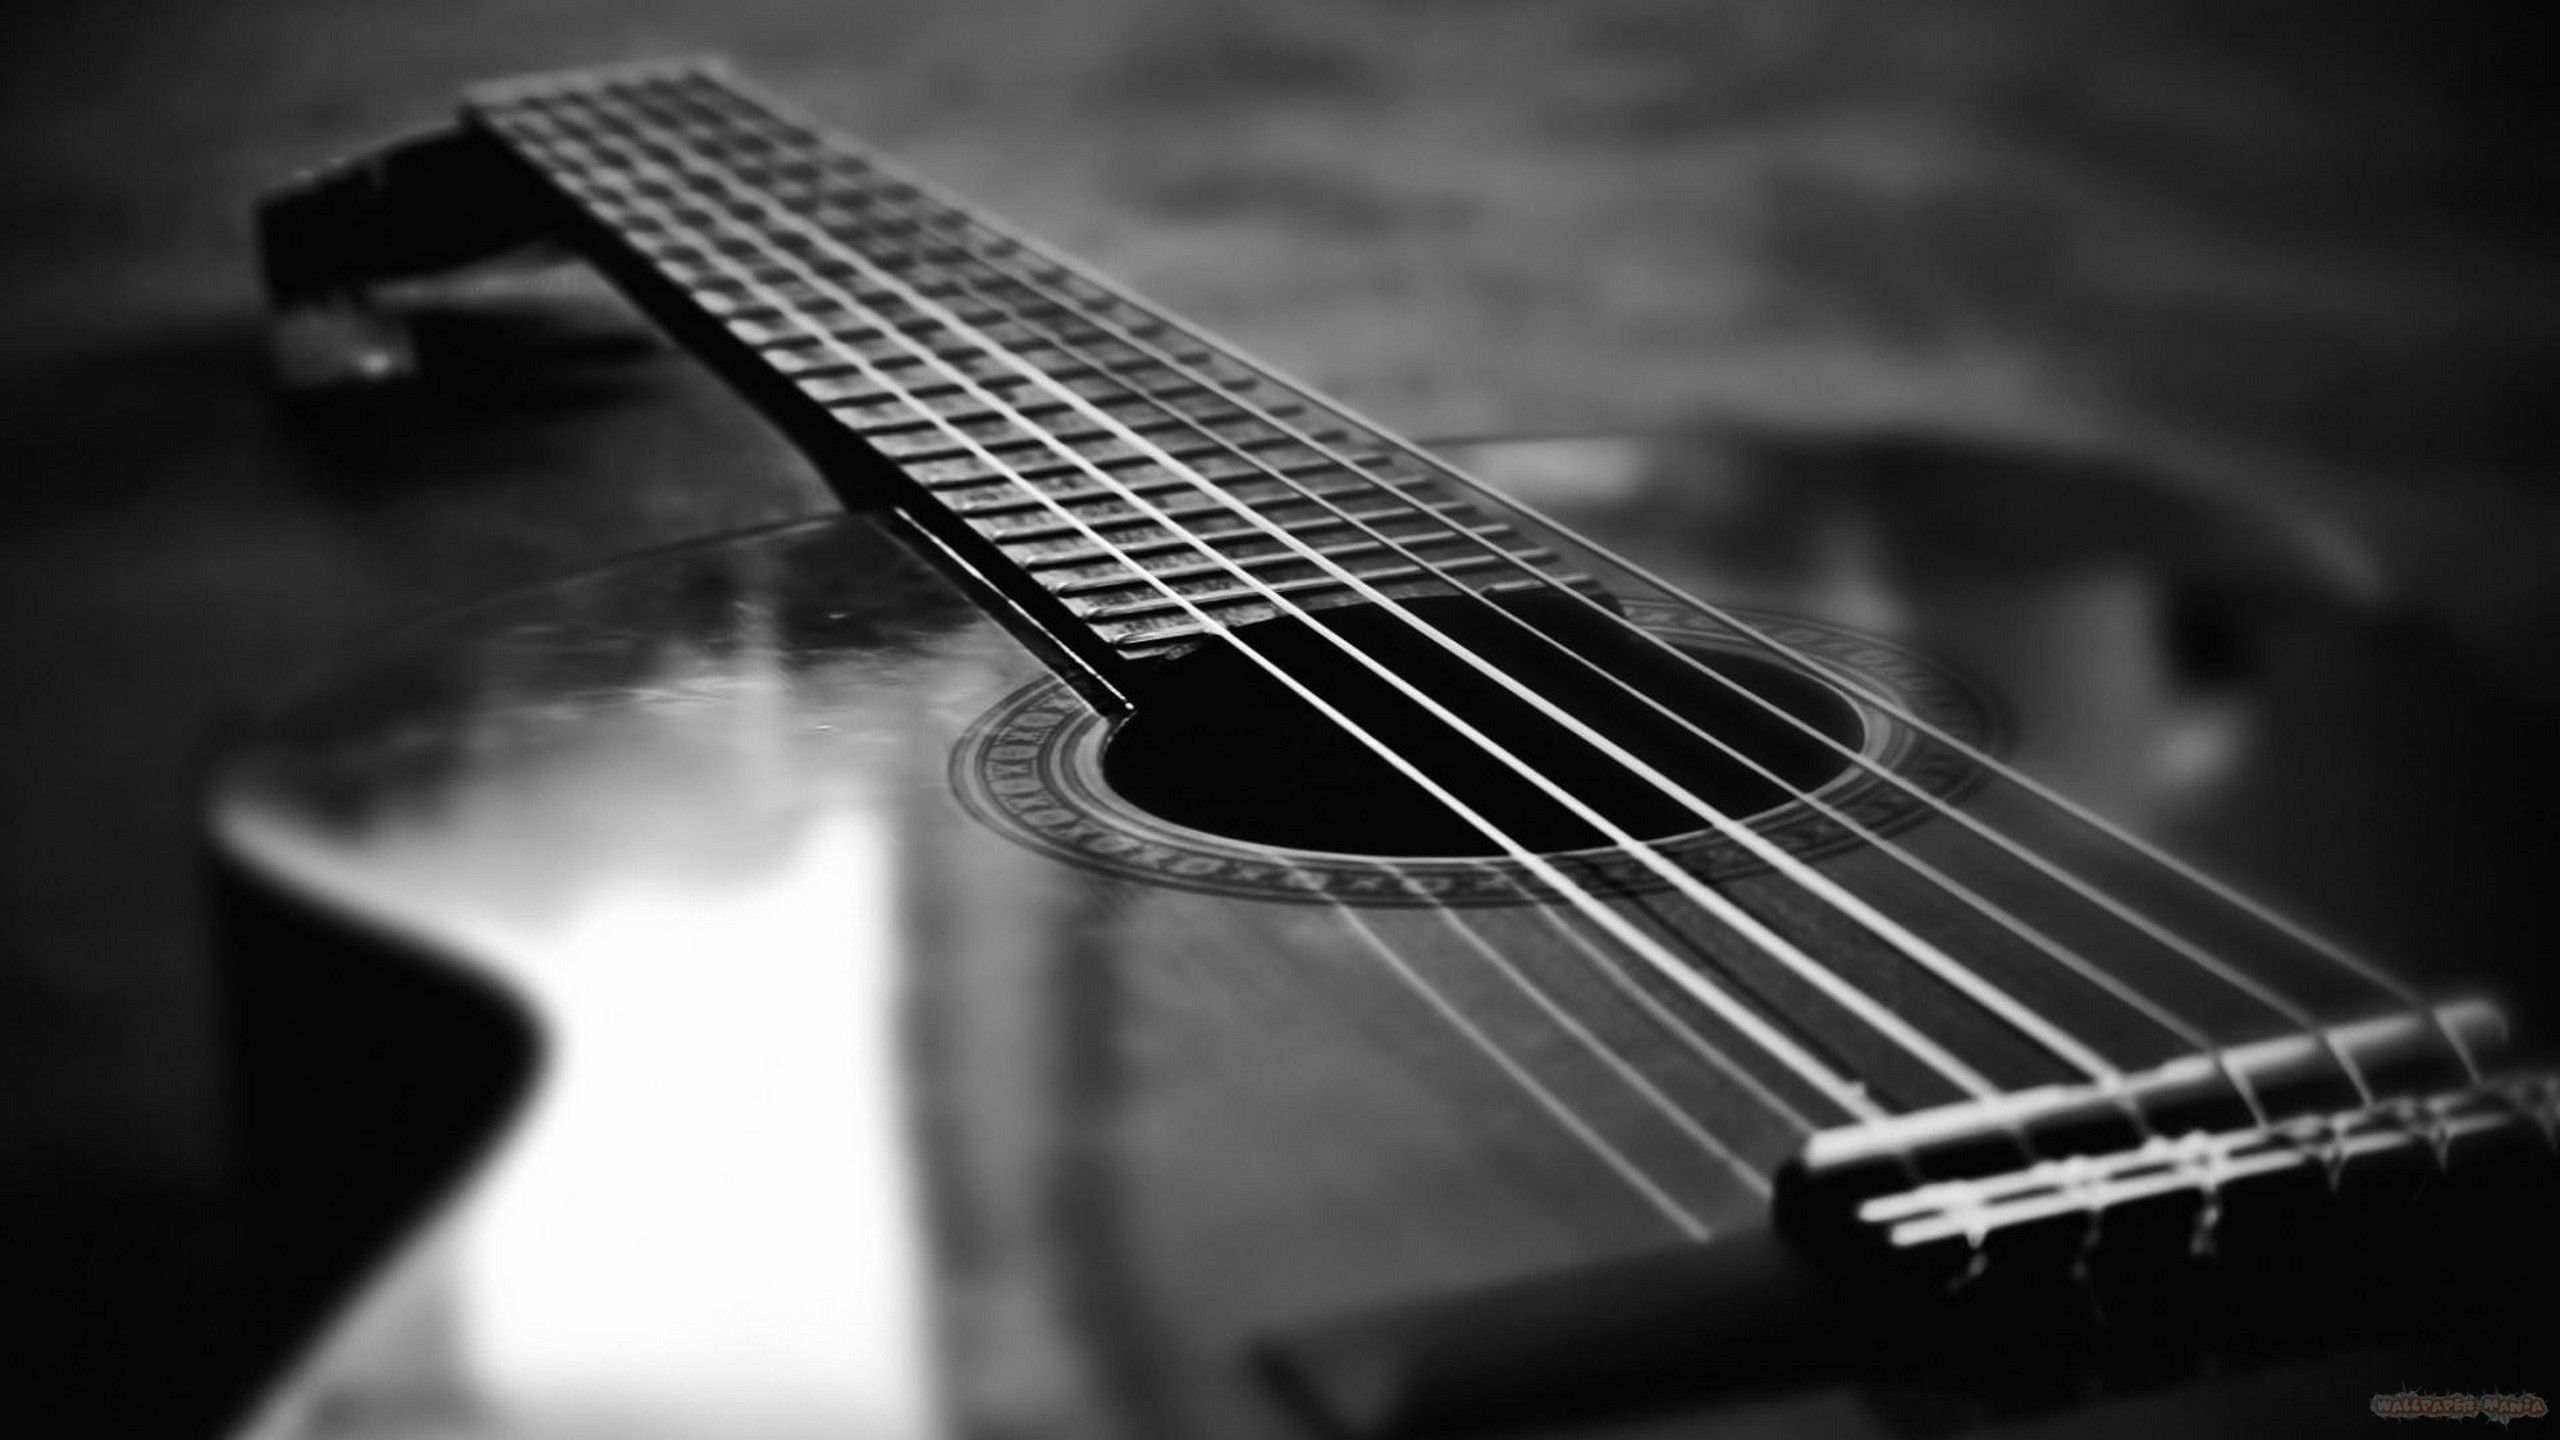 Acoustic Guitars Wallpaper Desktop Background Laptop Wallpaper Guitar Collection Guitar